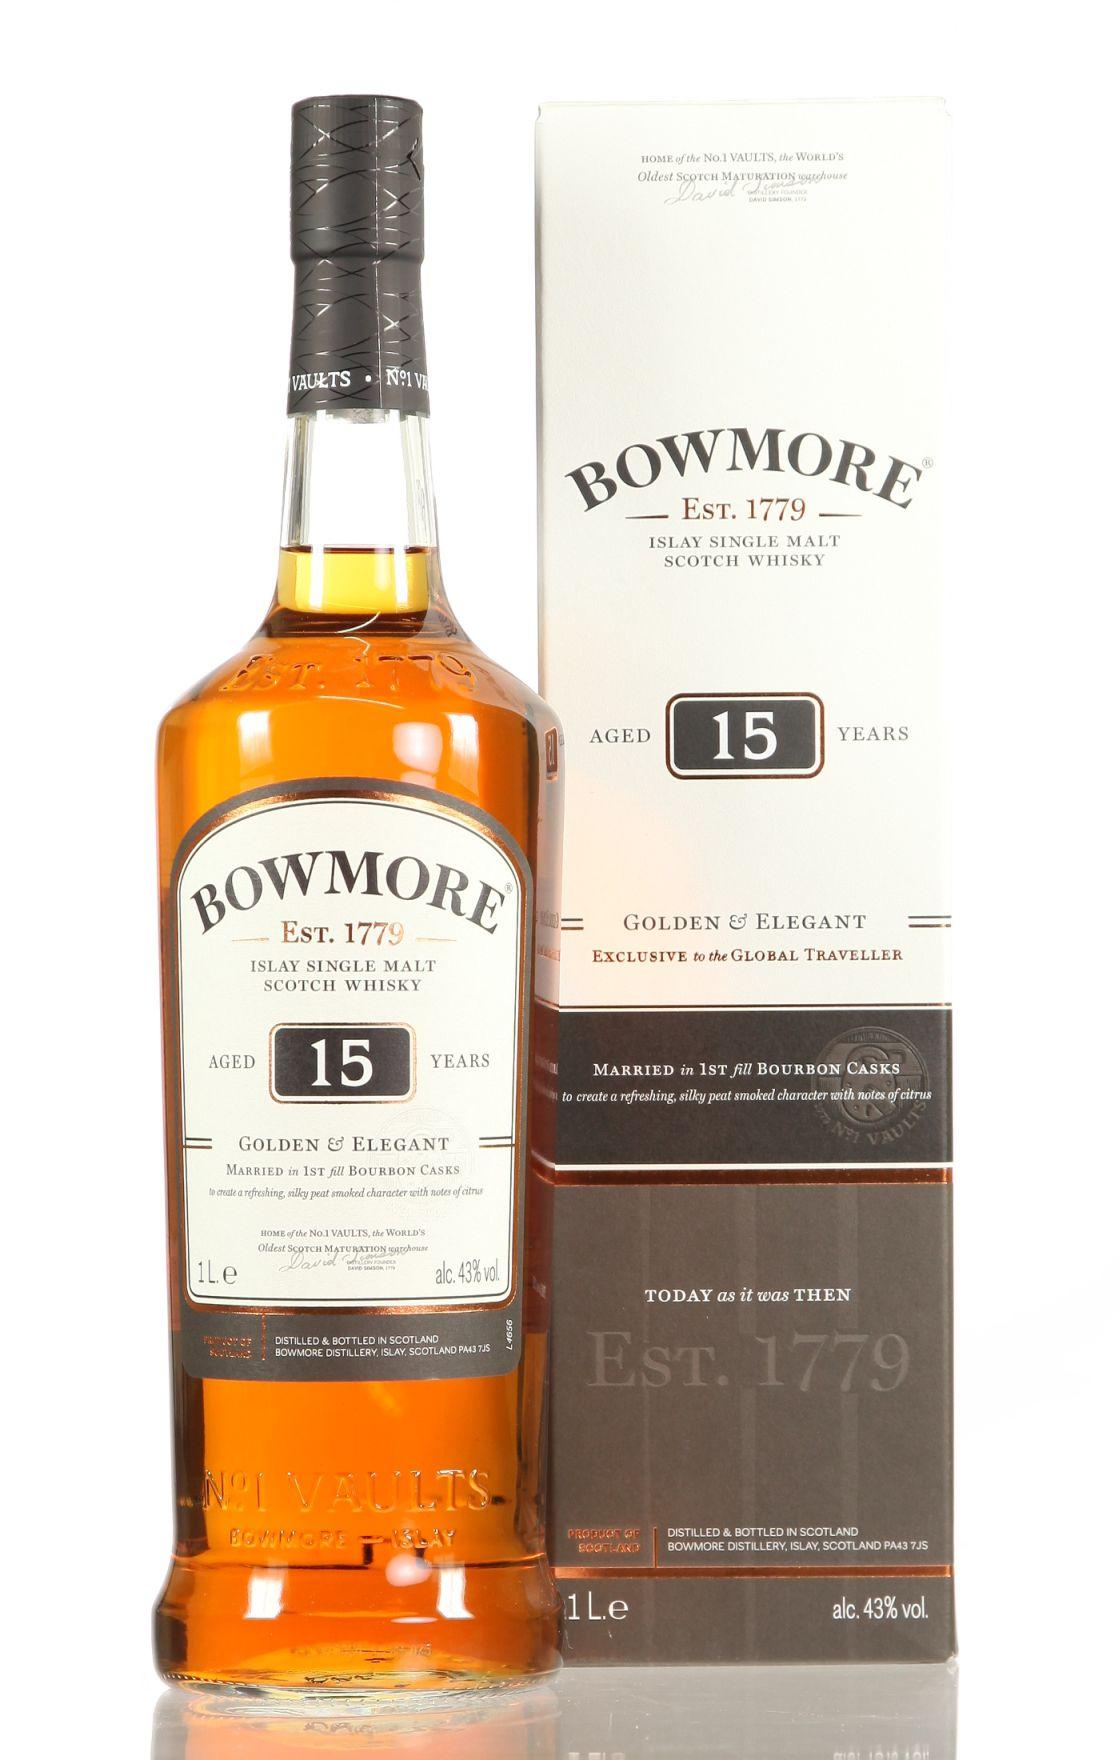 Bowmore Golden & Elegant